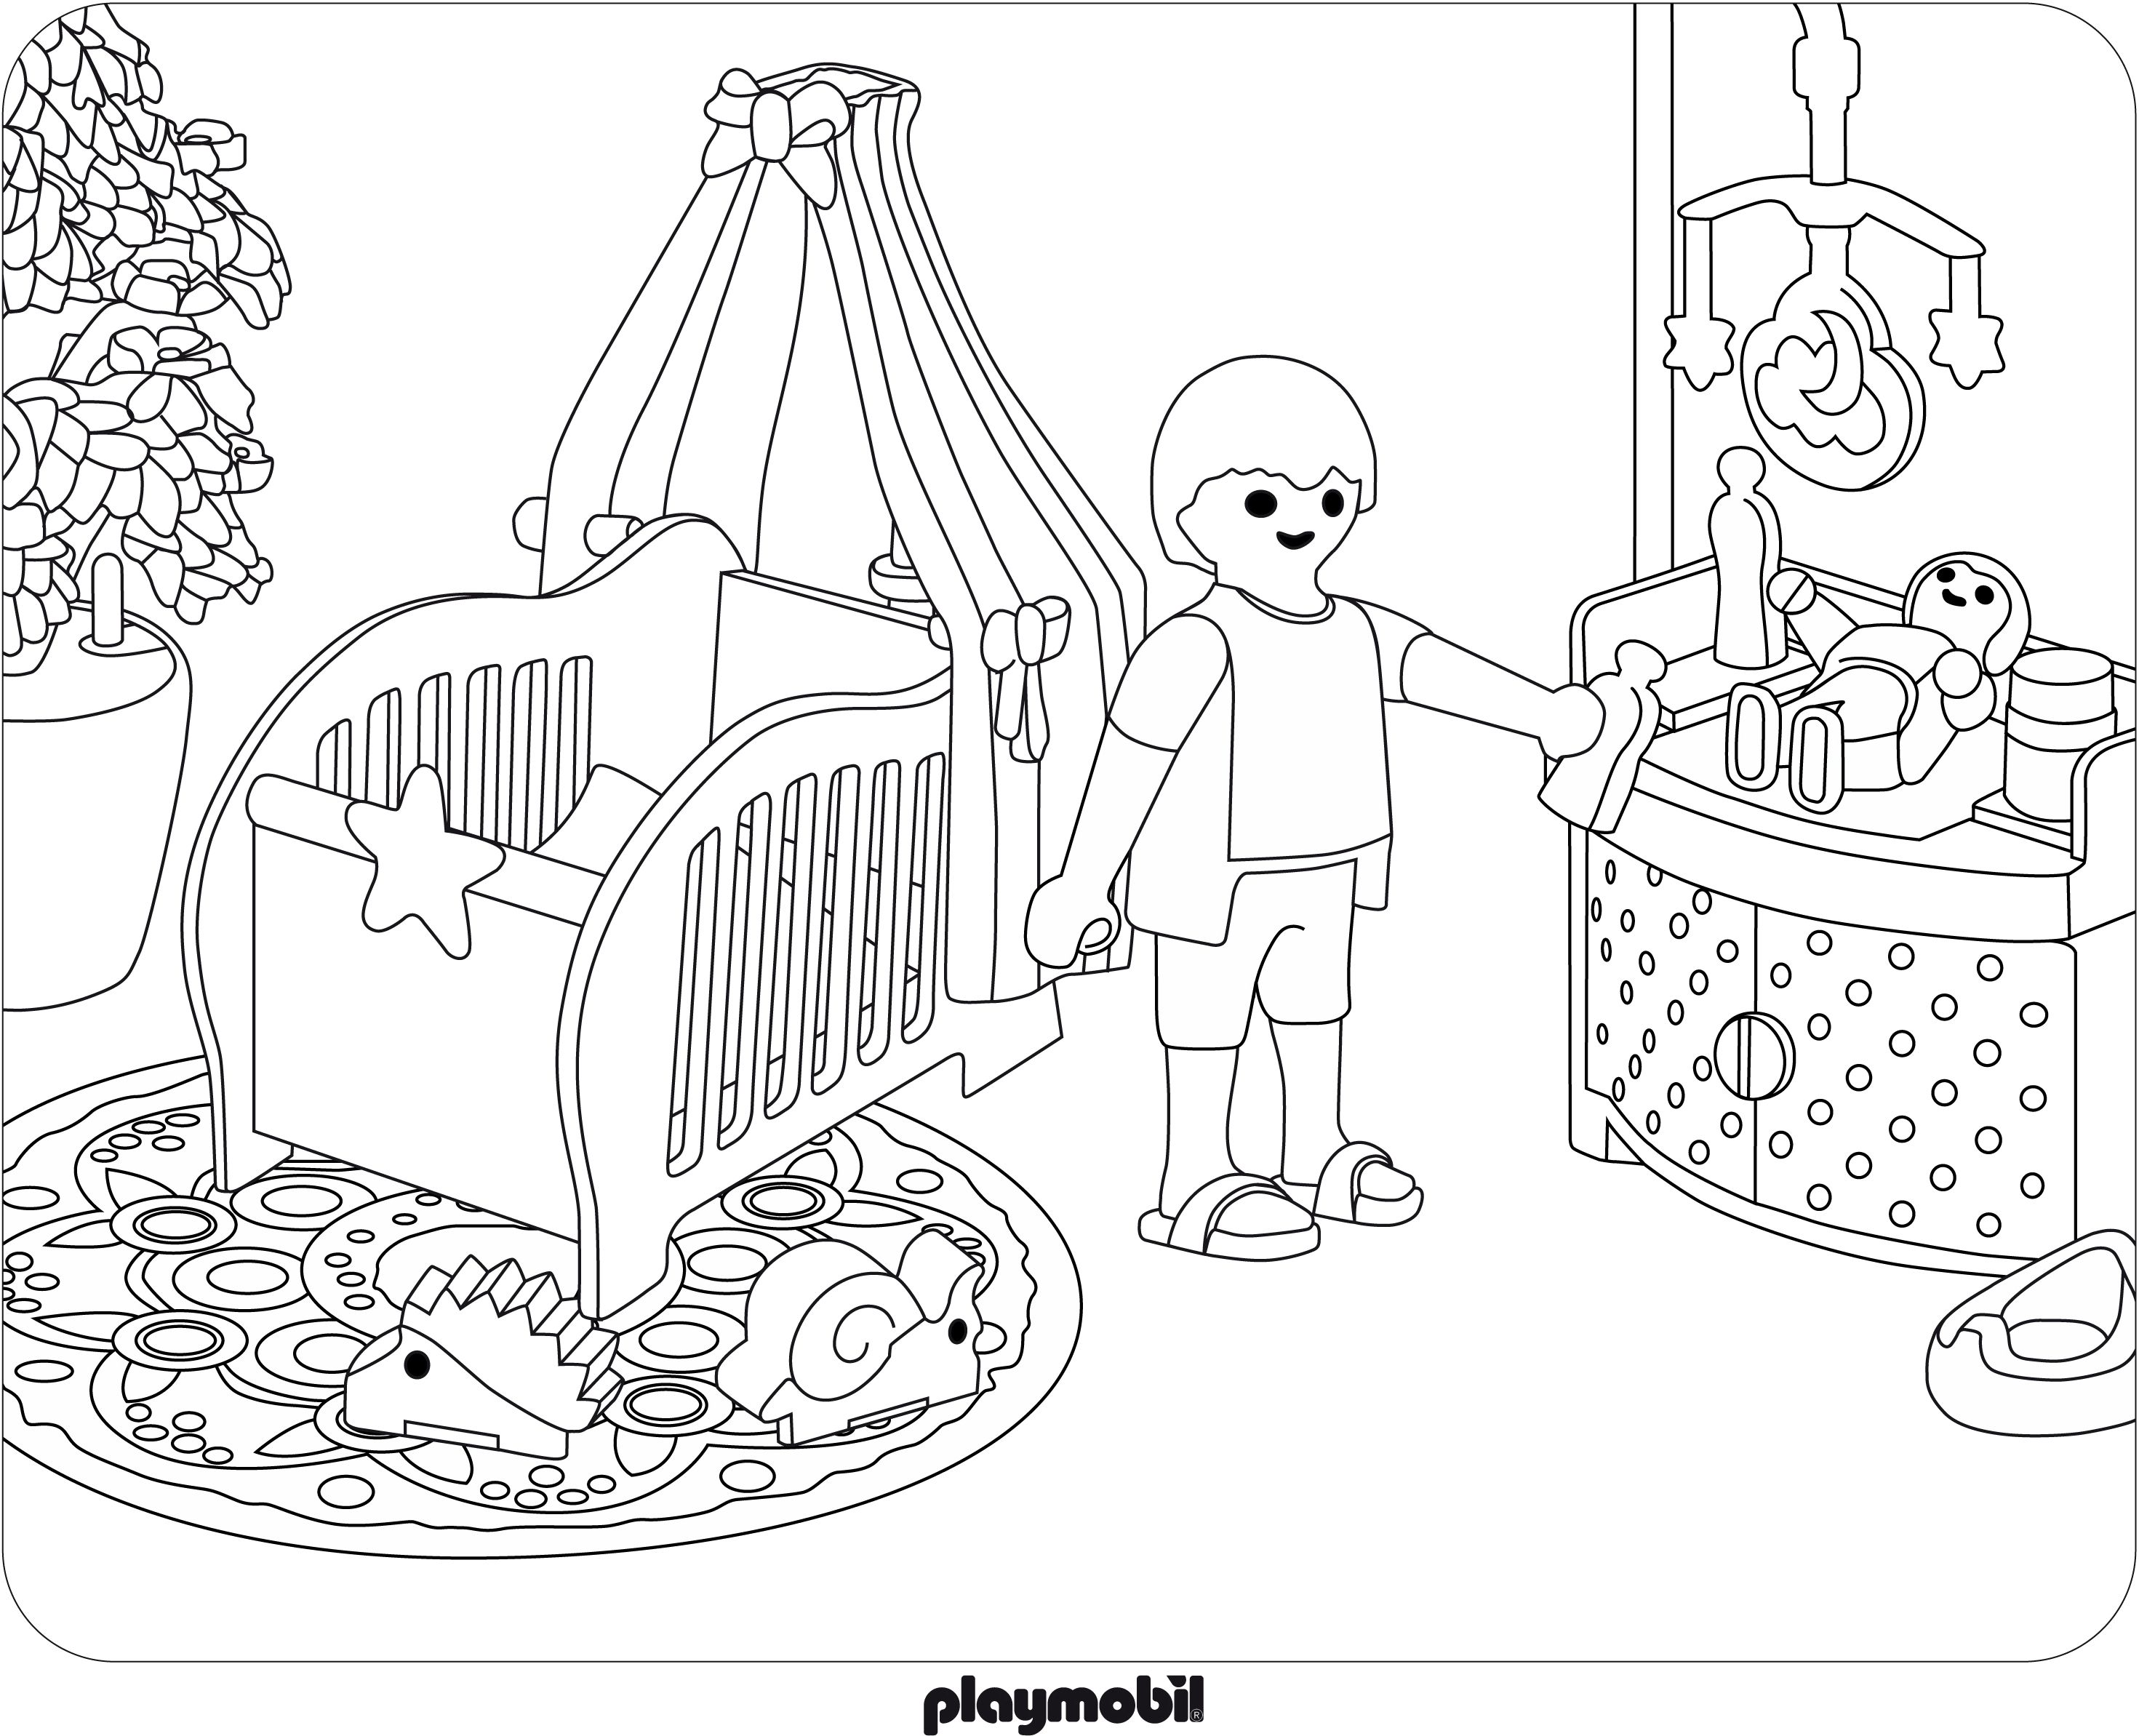 Ausmalbilder Playmobil